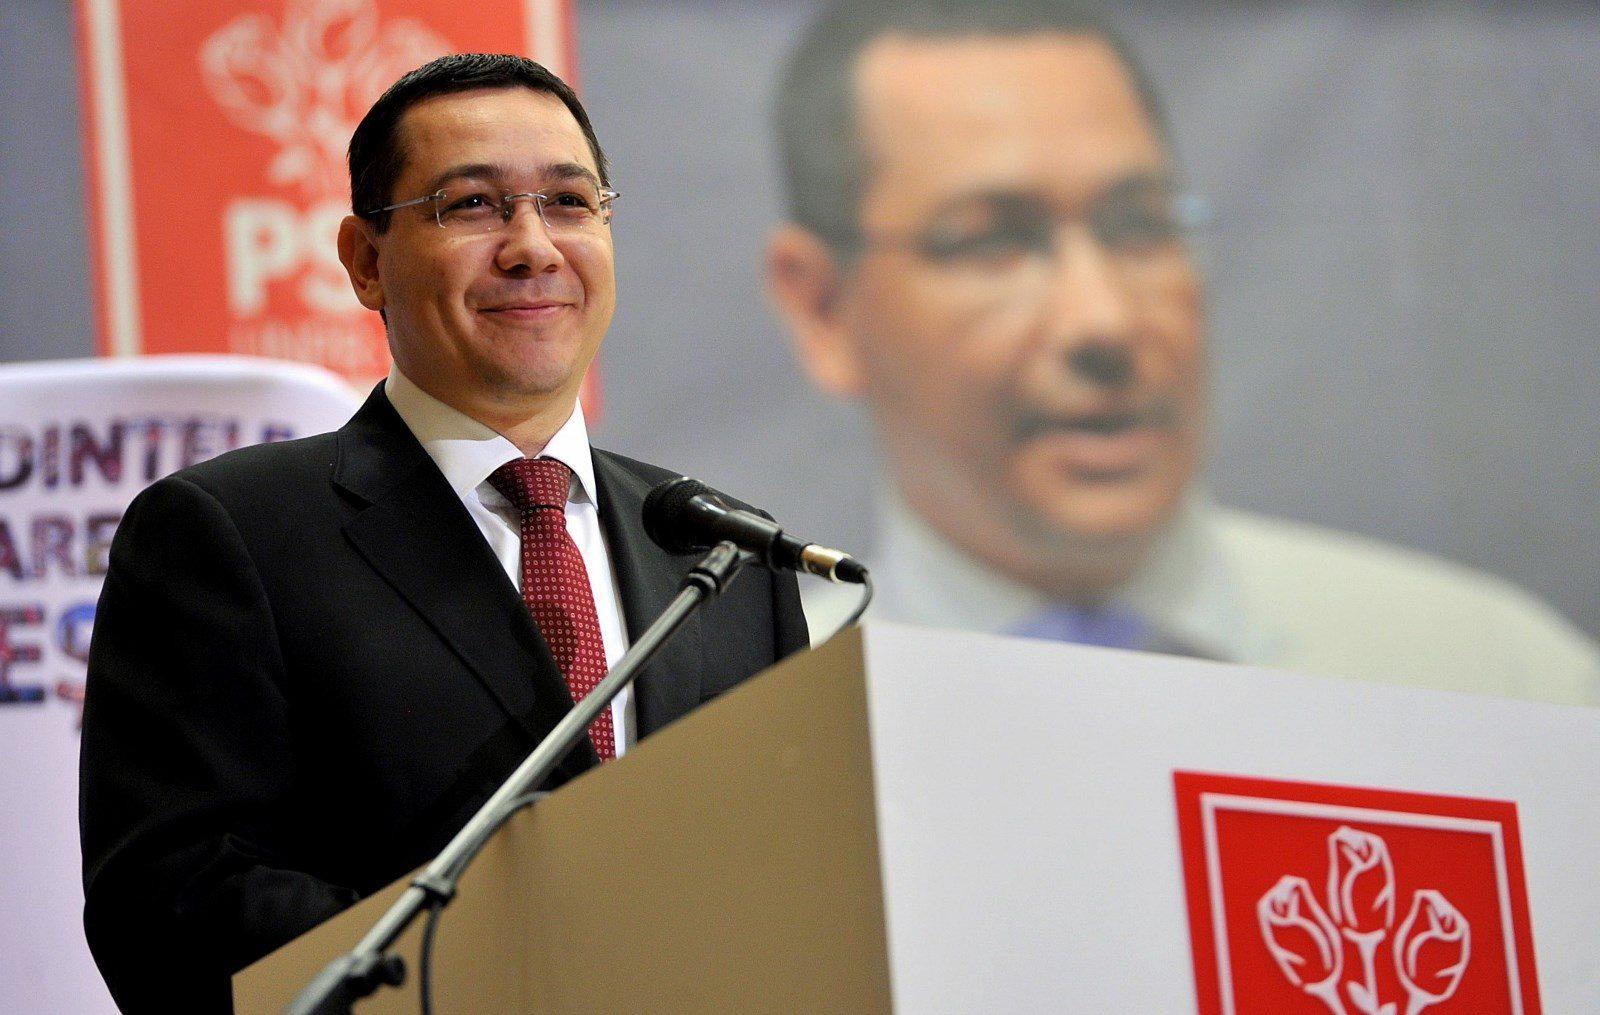 Desi nu avea 18 ani in 1990, Victor Ponta a votat perfect legal